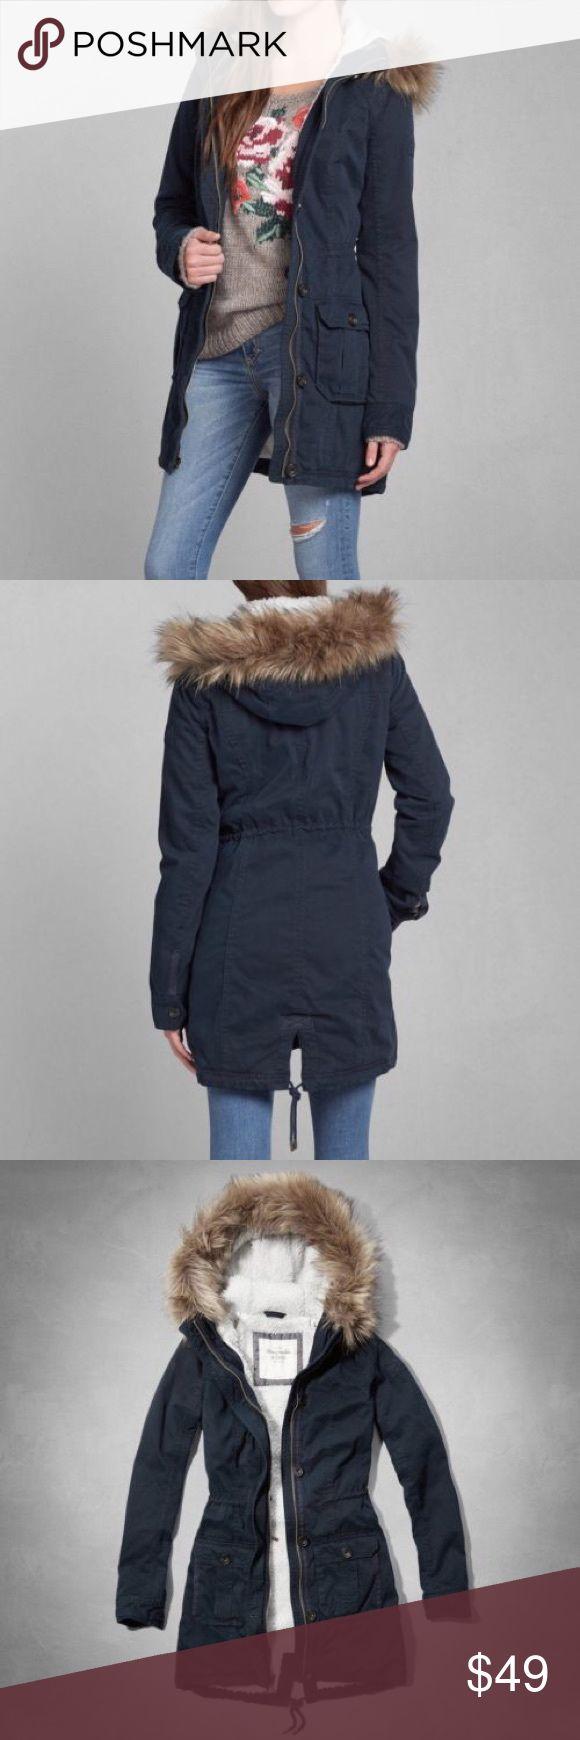 Abercrombie and Fitch navy fur hood coat sz m Abercrombie and Fitch navy coat. In size medium. With fur trim hood. Adjustable drawstring waist feature. Tech pocket inside. Abercrombie & Fitch Jackets & Coats Utility Jackets